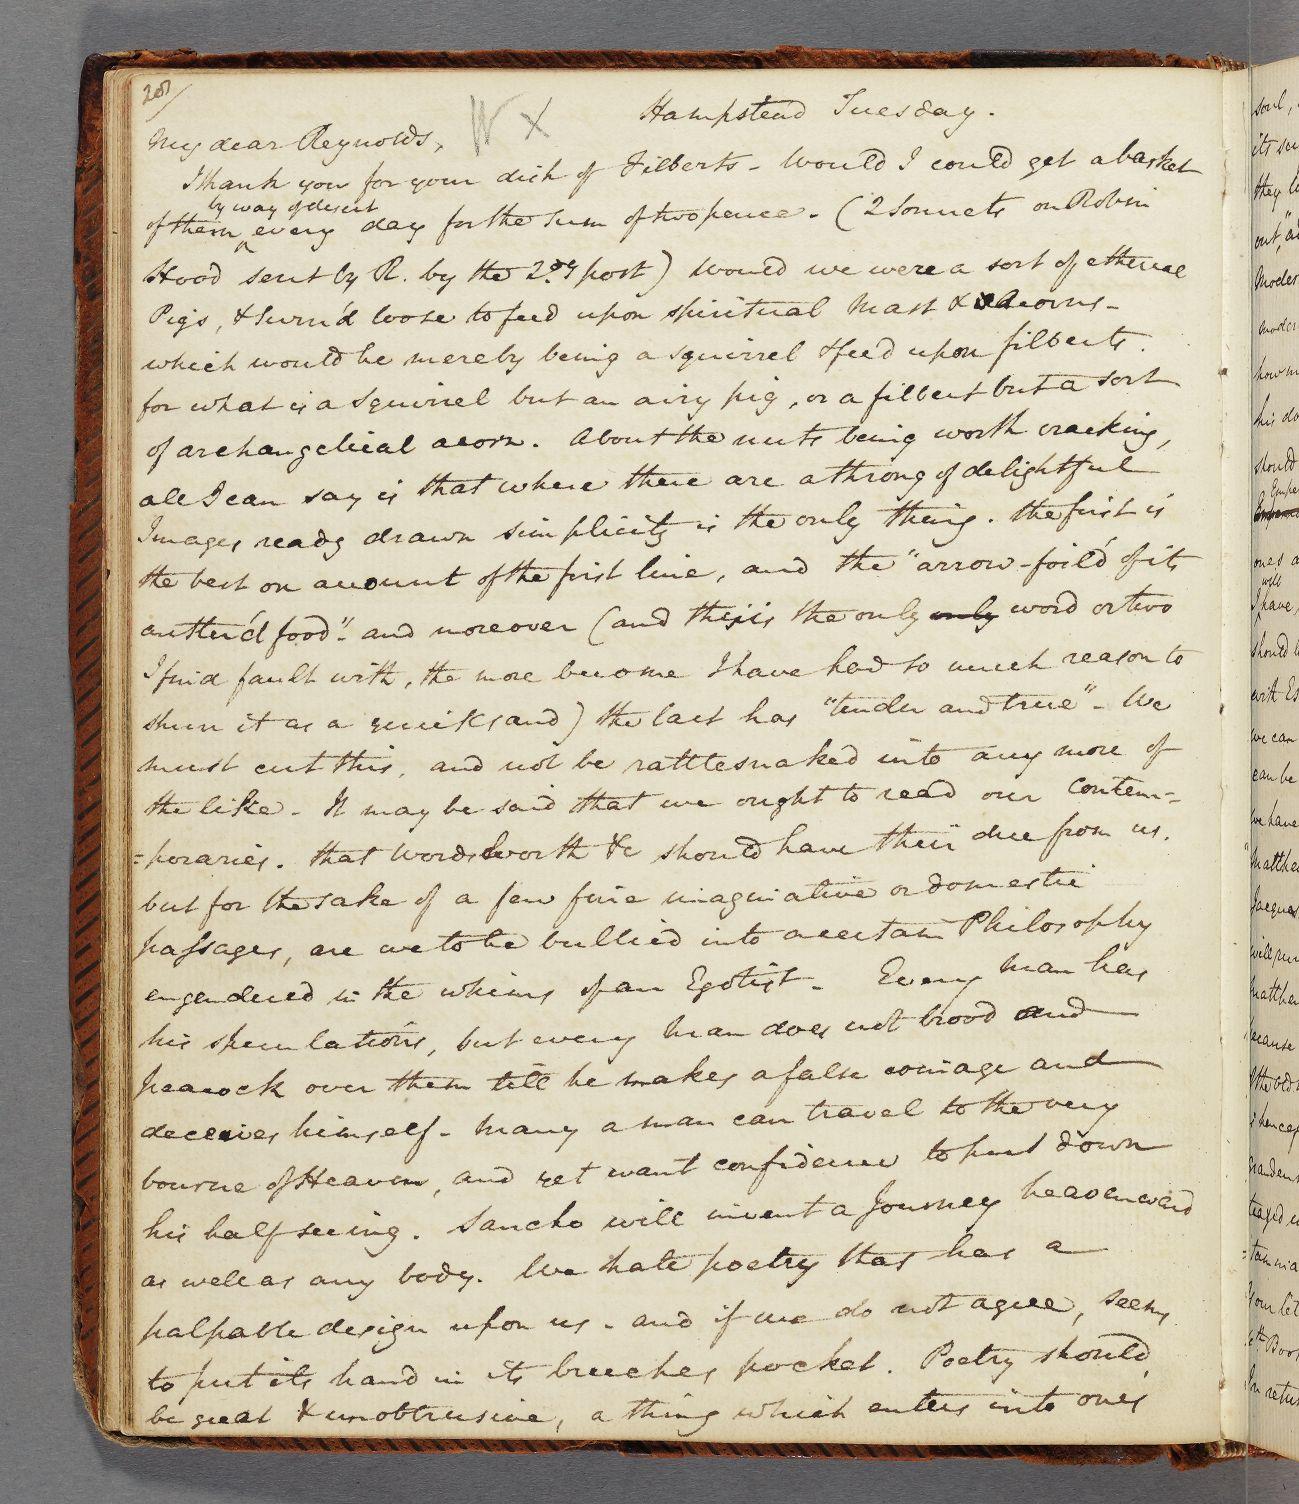 Letter #51: To John Hamilton Reynolds, 3 February 1818 – The